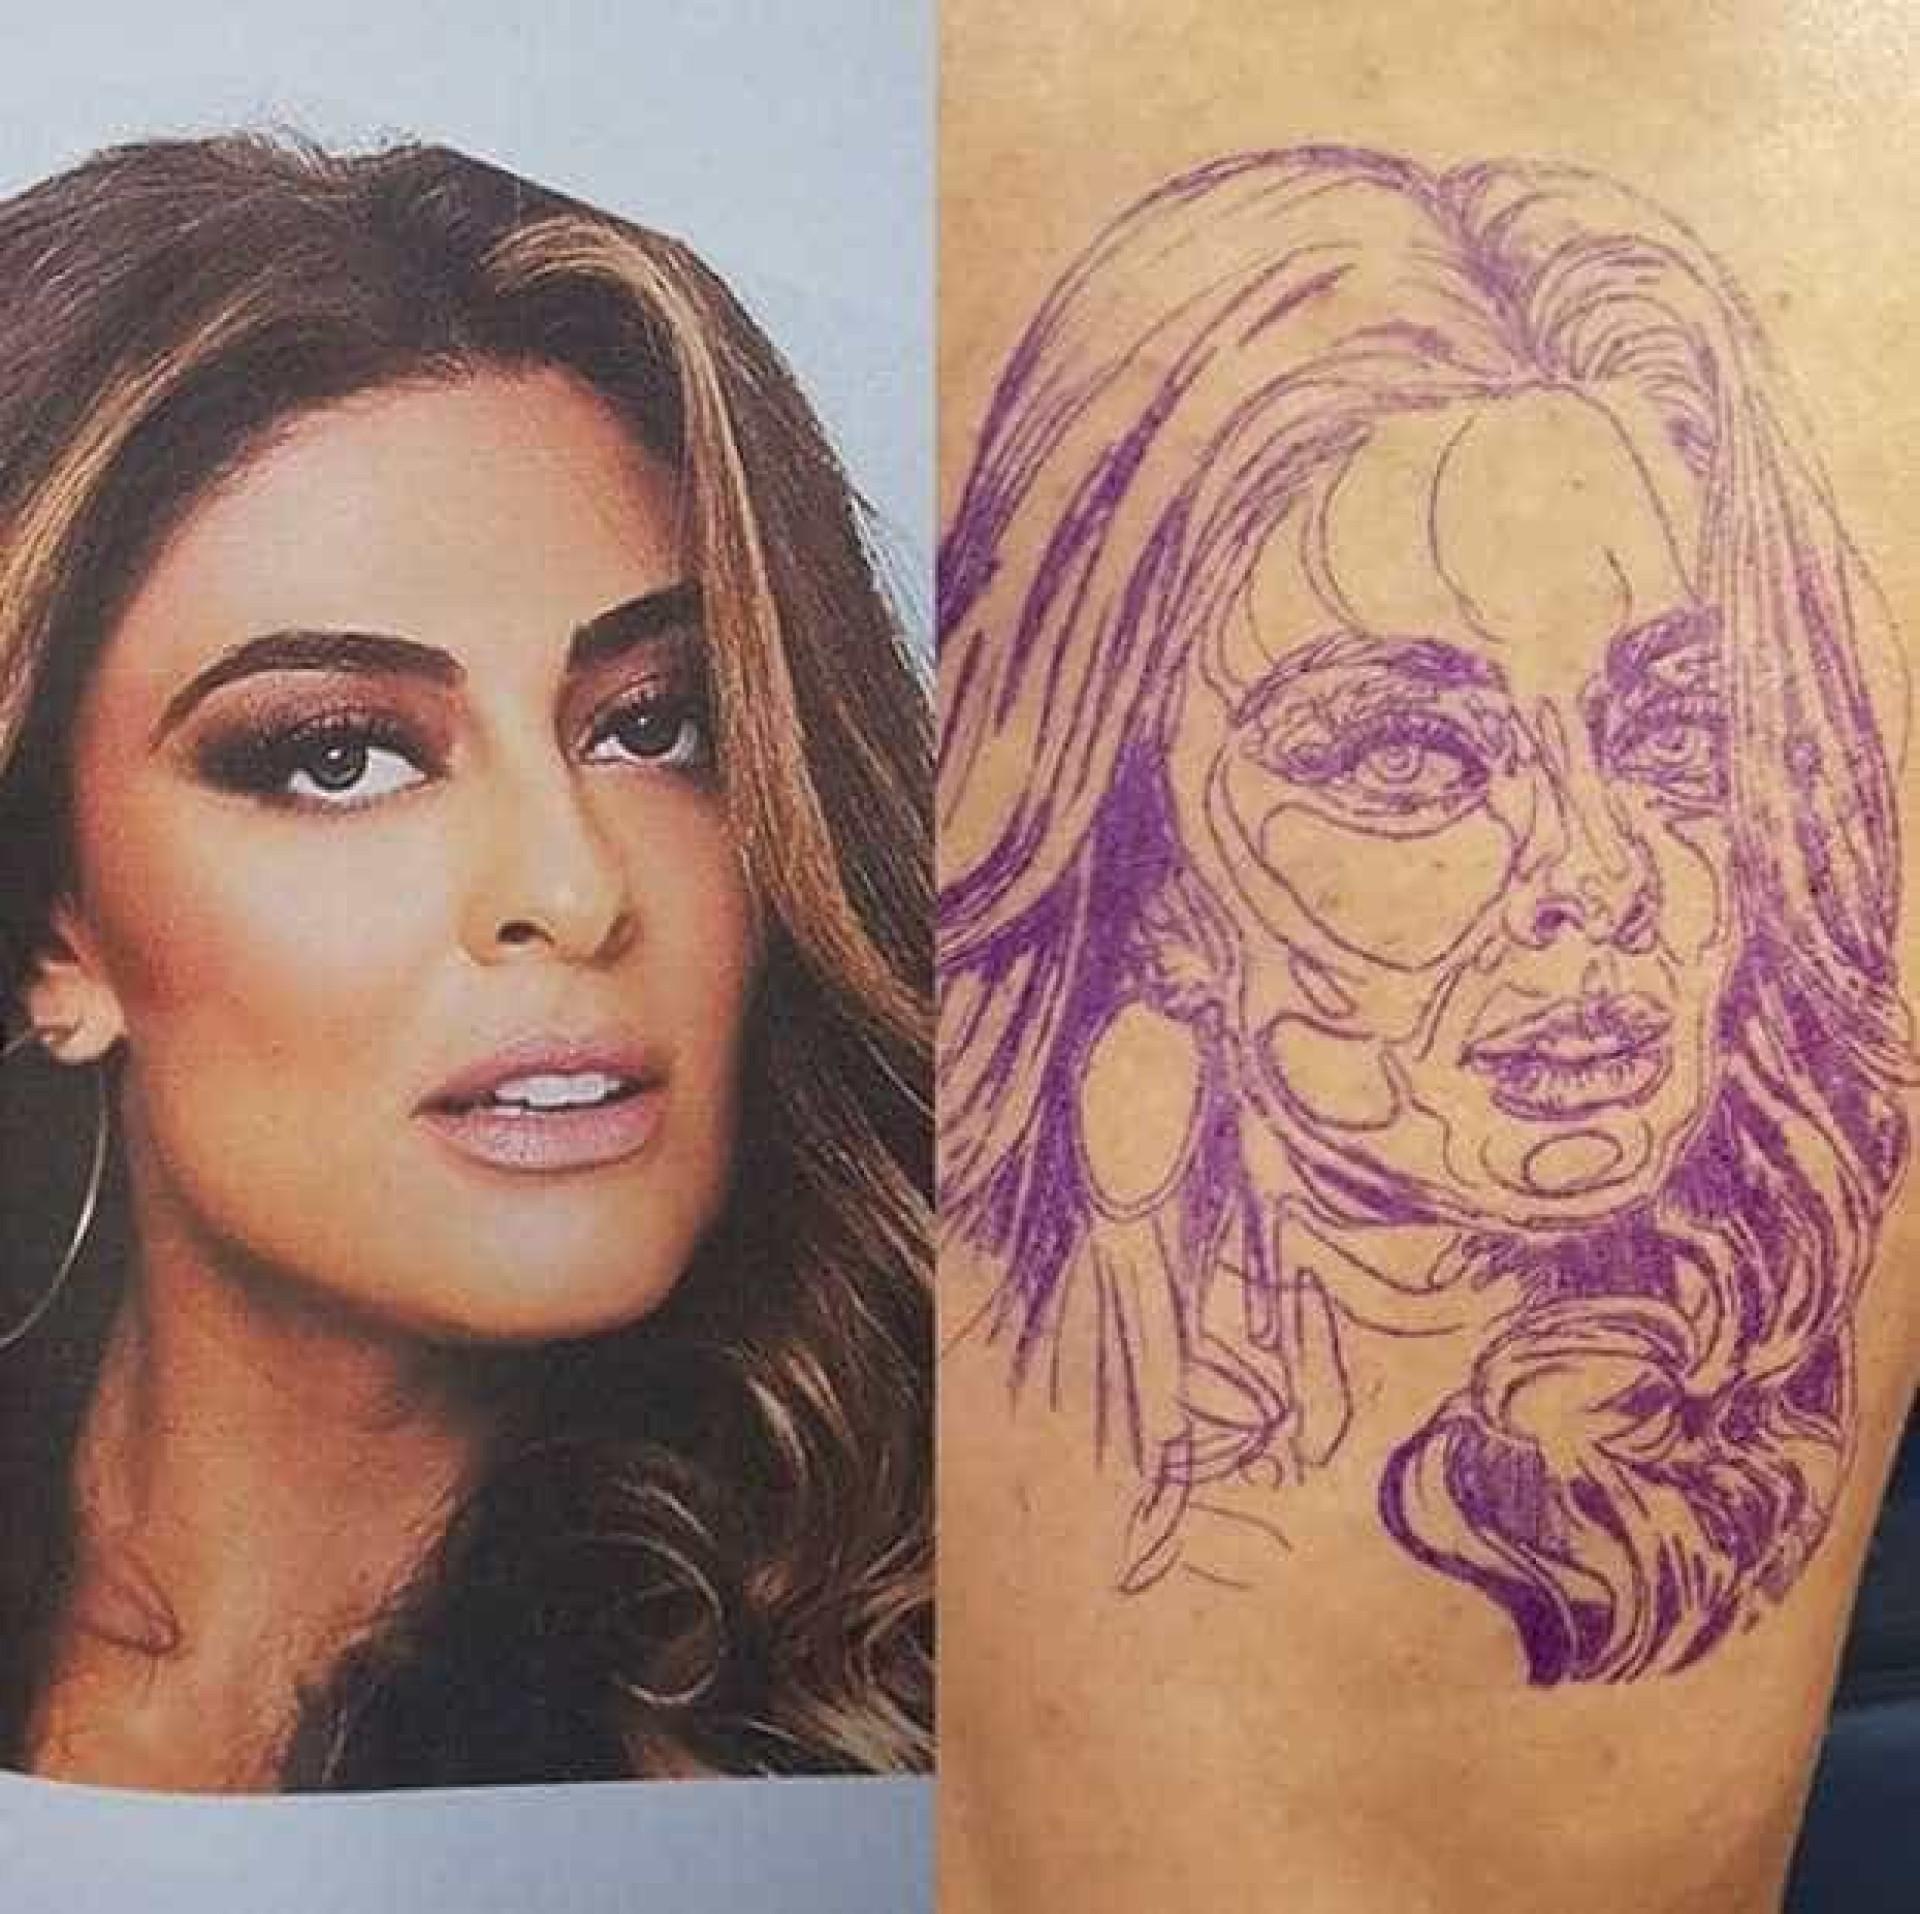 Fã tatua cara de Juliana Paes numa perna